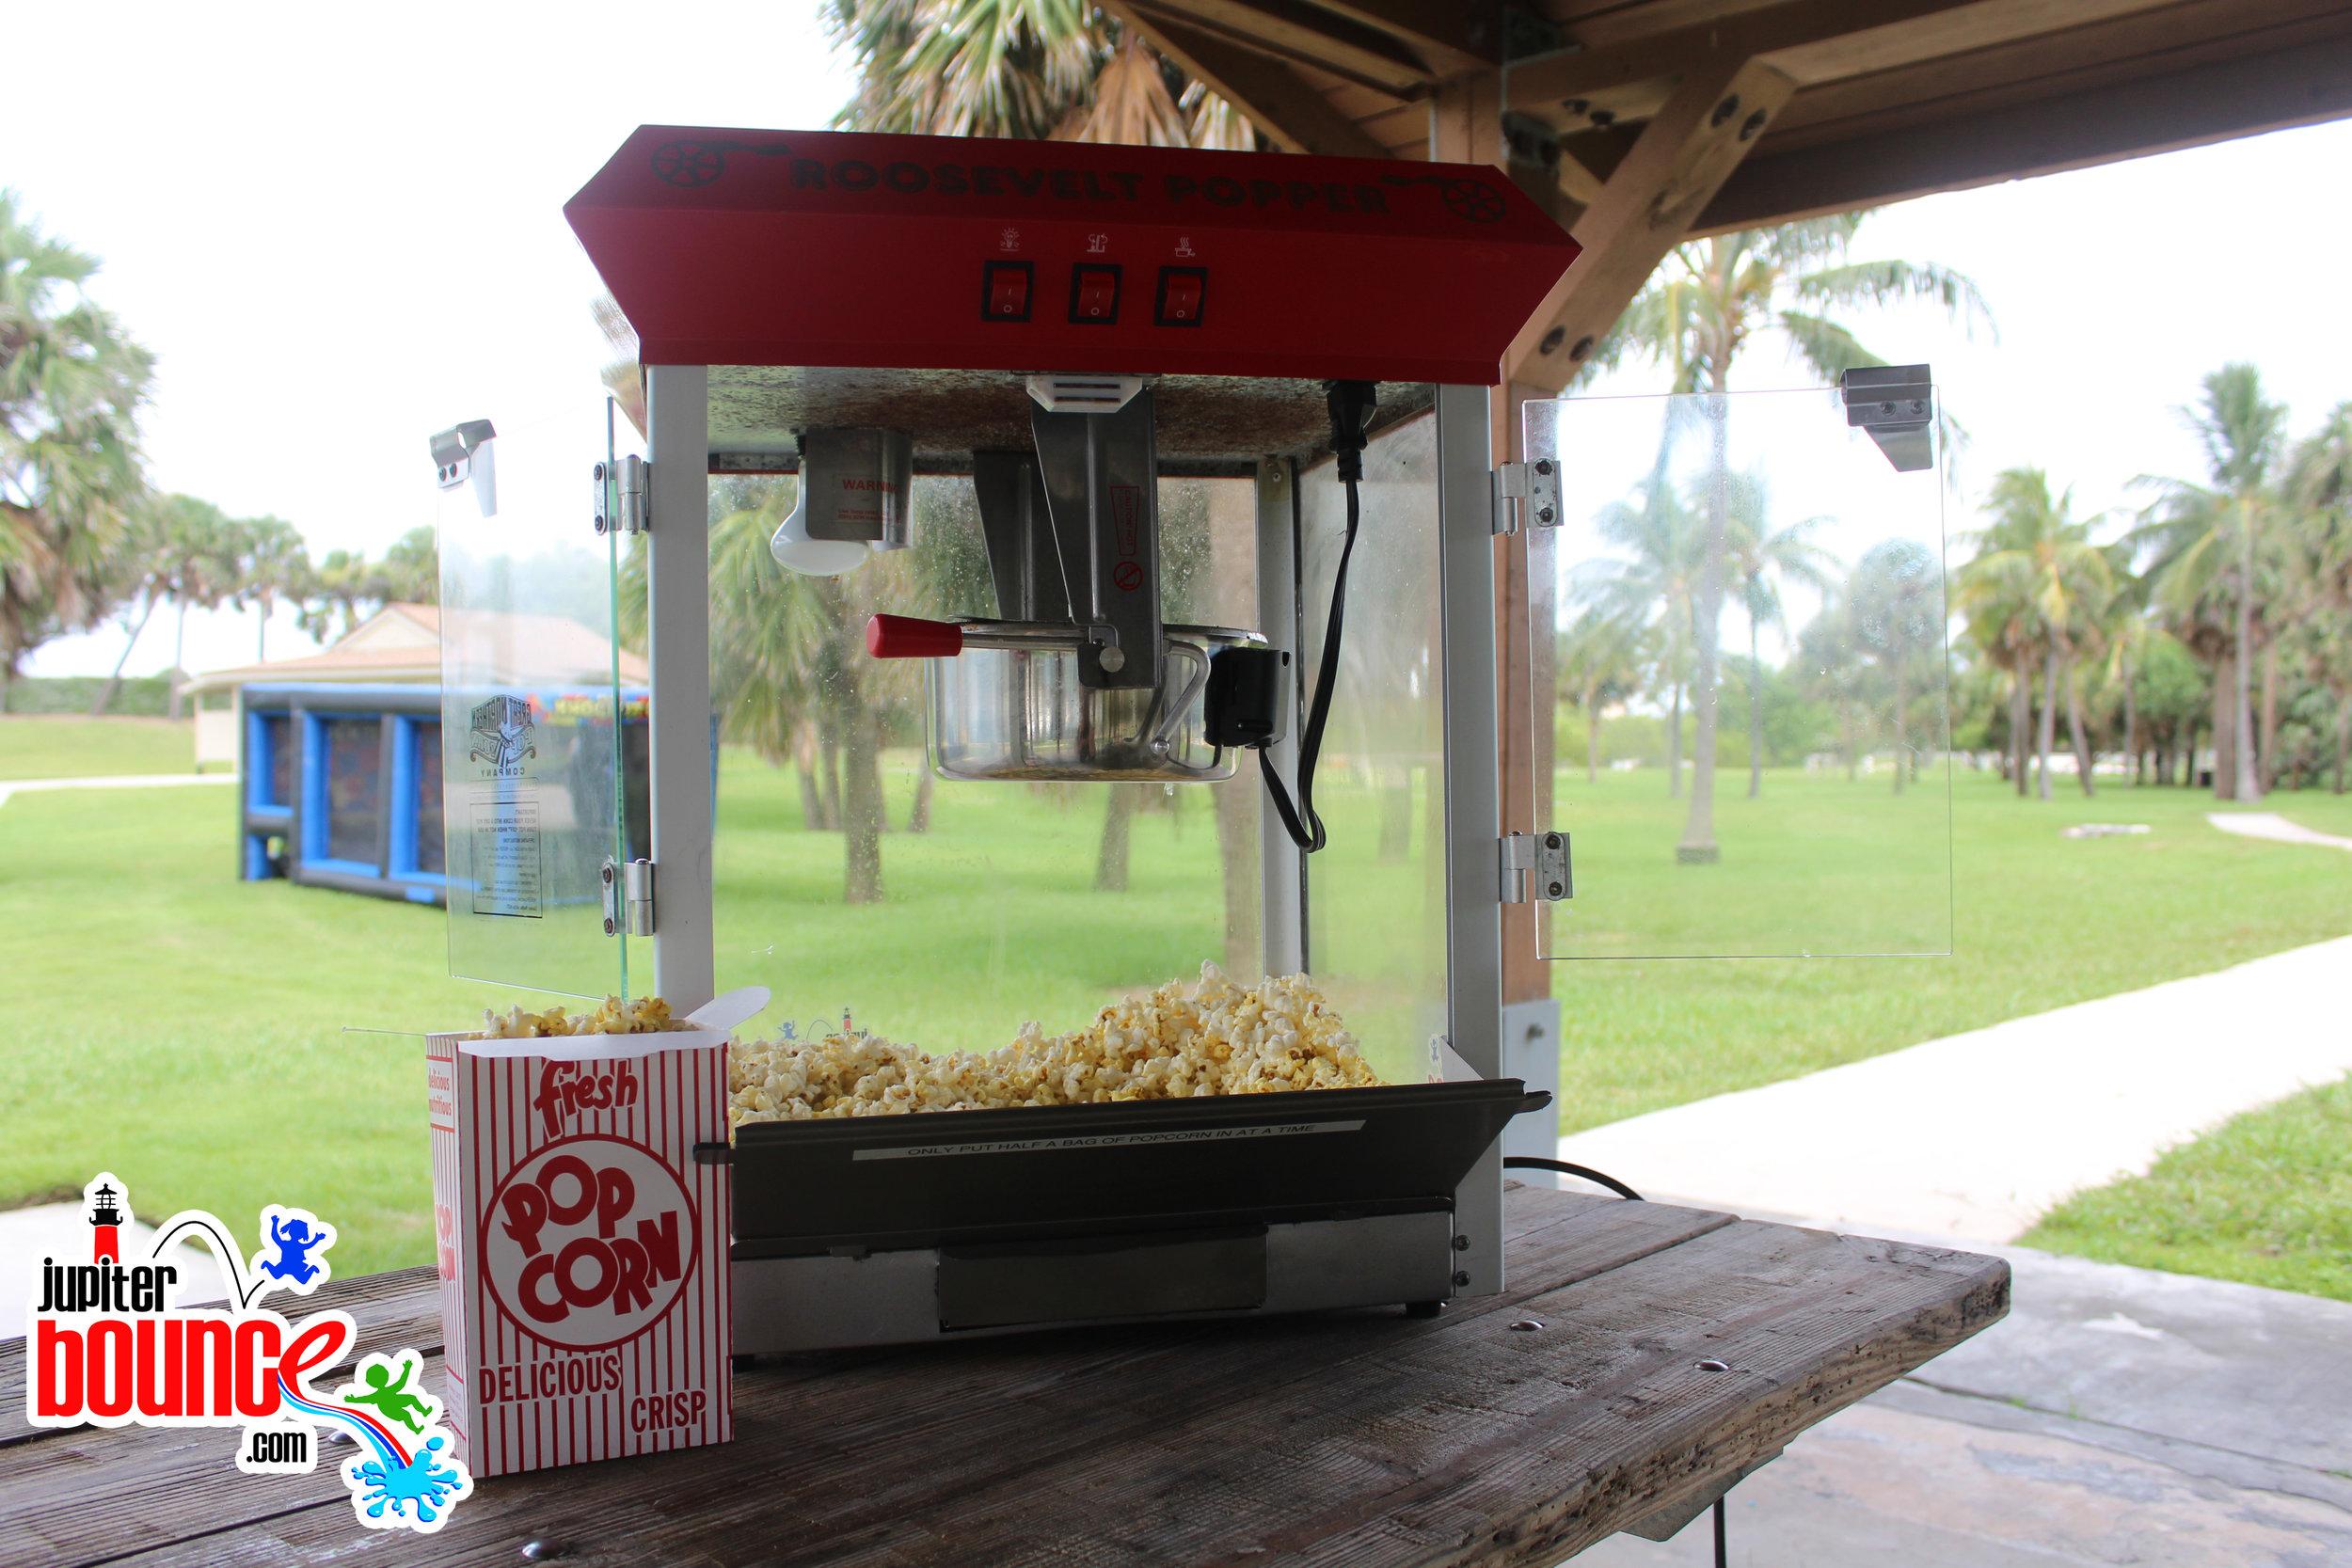 popcornmachine-jupiterbouncehousrentals-westpalmbeach-martincounty-stuart-portsalerno-royalpalm-northpalm-hypoluxo-rockwall-mechanicalbull.jpg